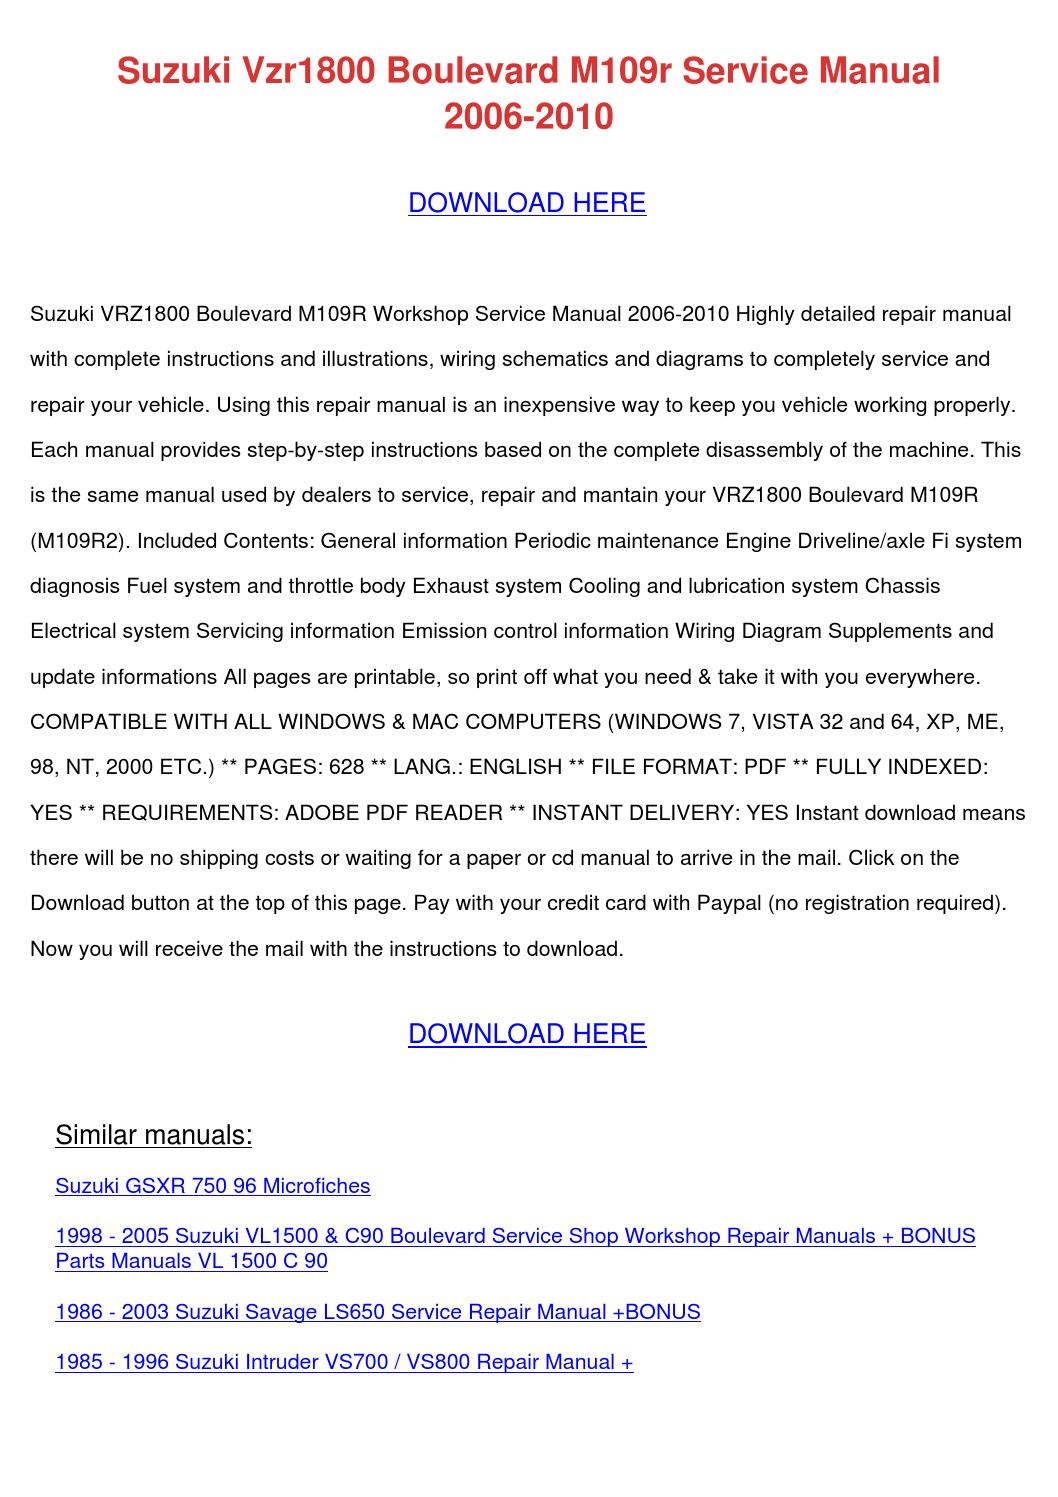 Suzuki Vzr1800 Boulevard M109r Service Manual By Marymcclung Issuu 1986 Samurai Engine Wiring Diagram